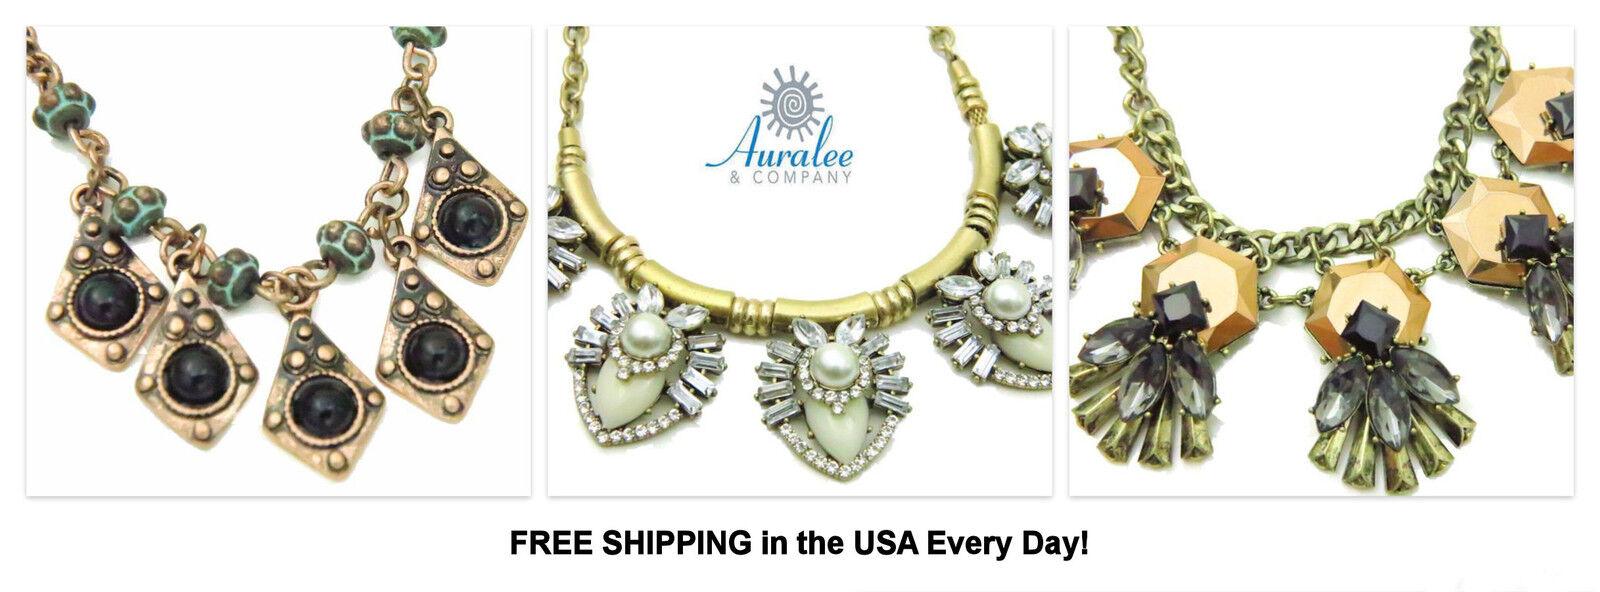 Auralee & Company